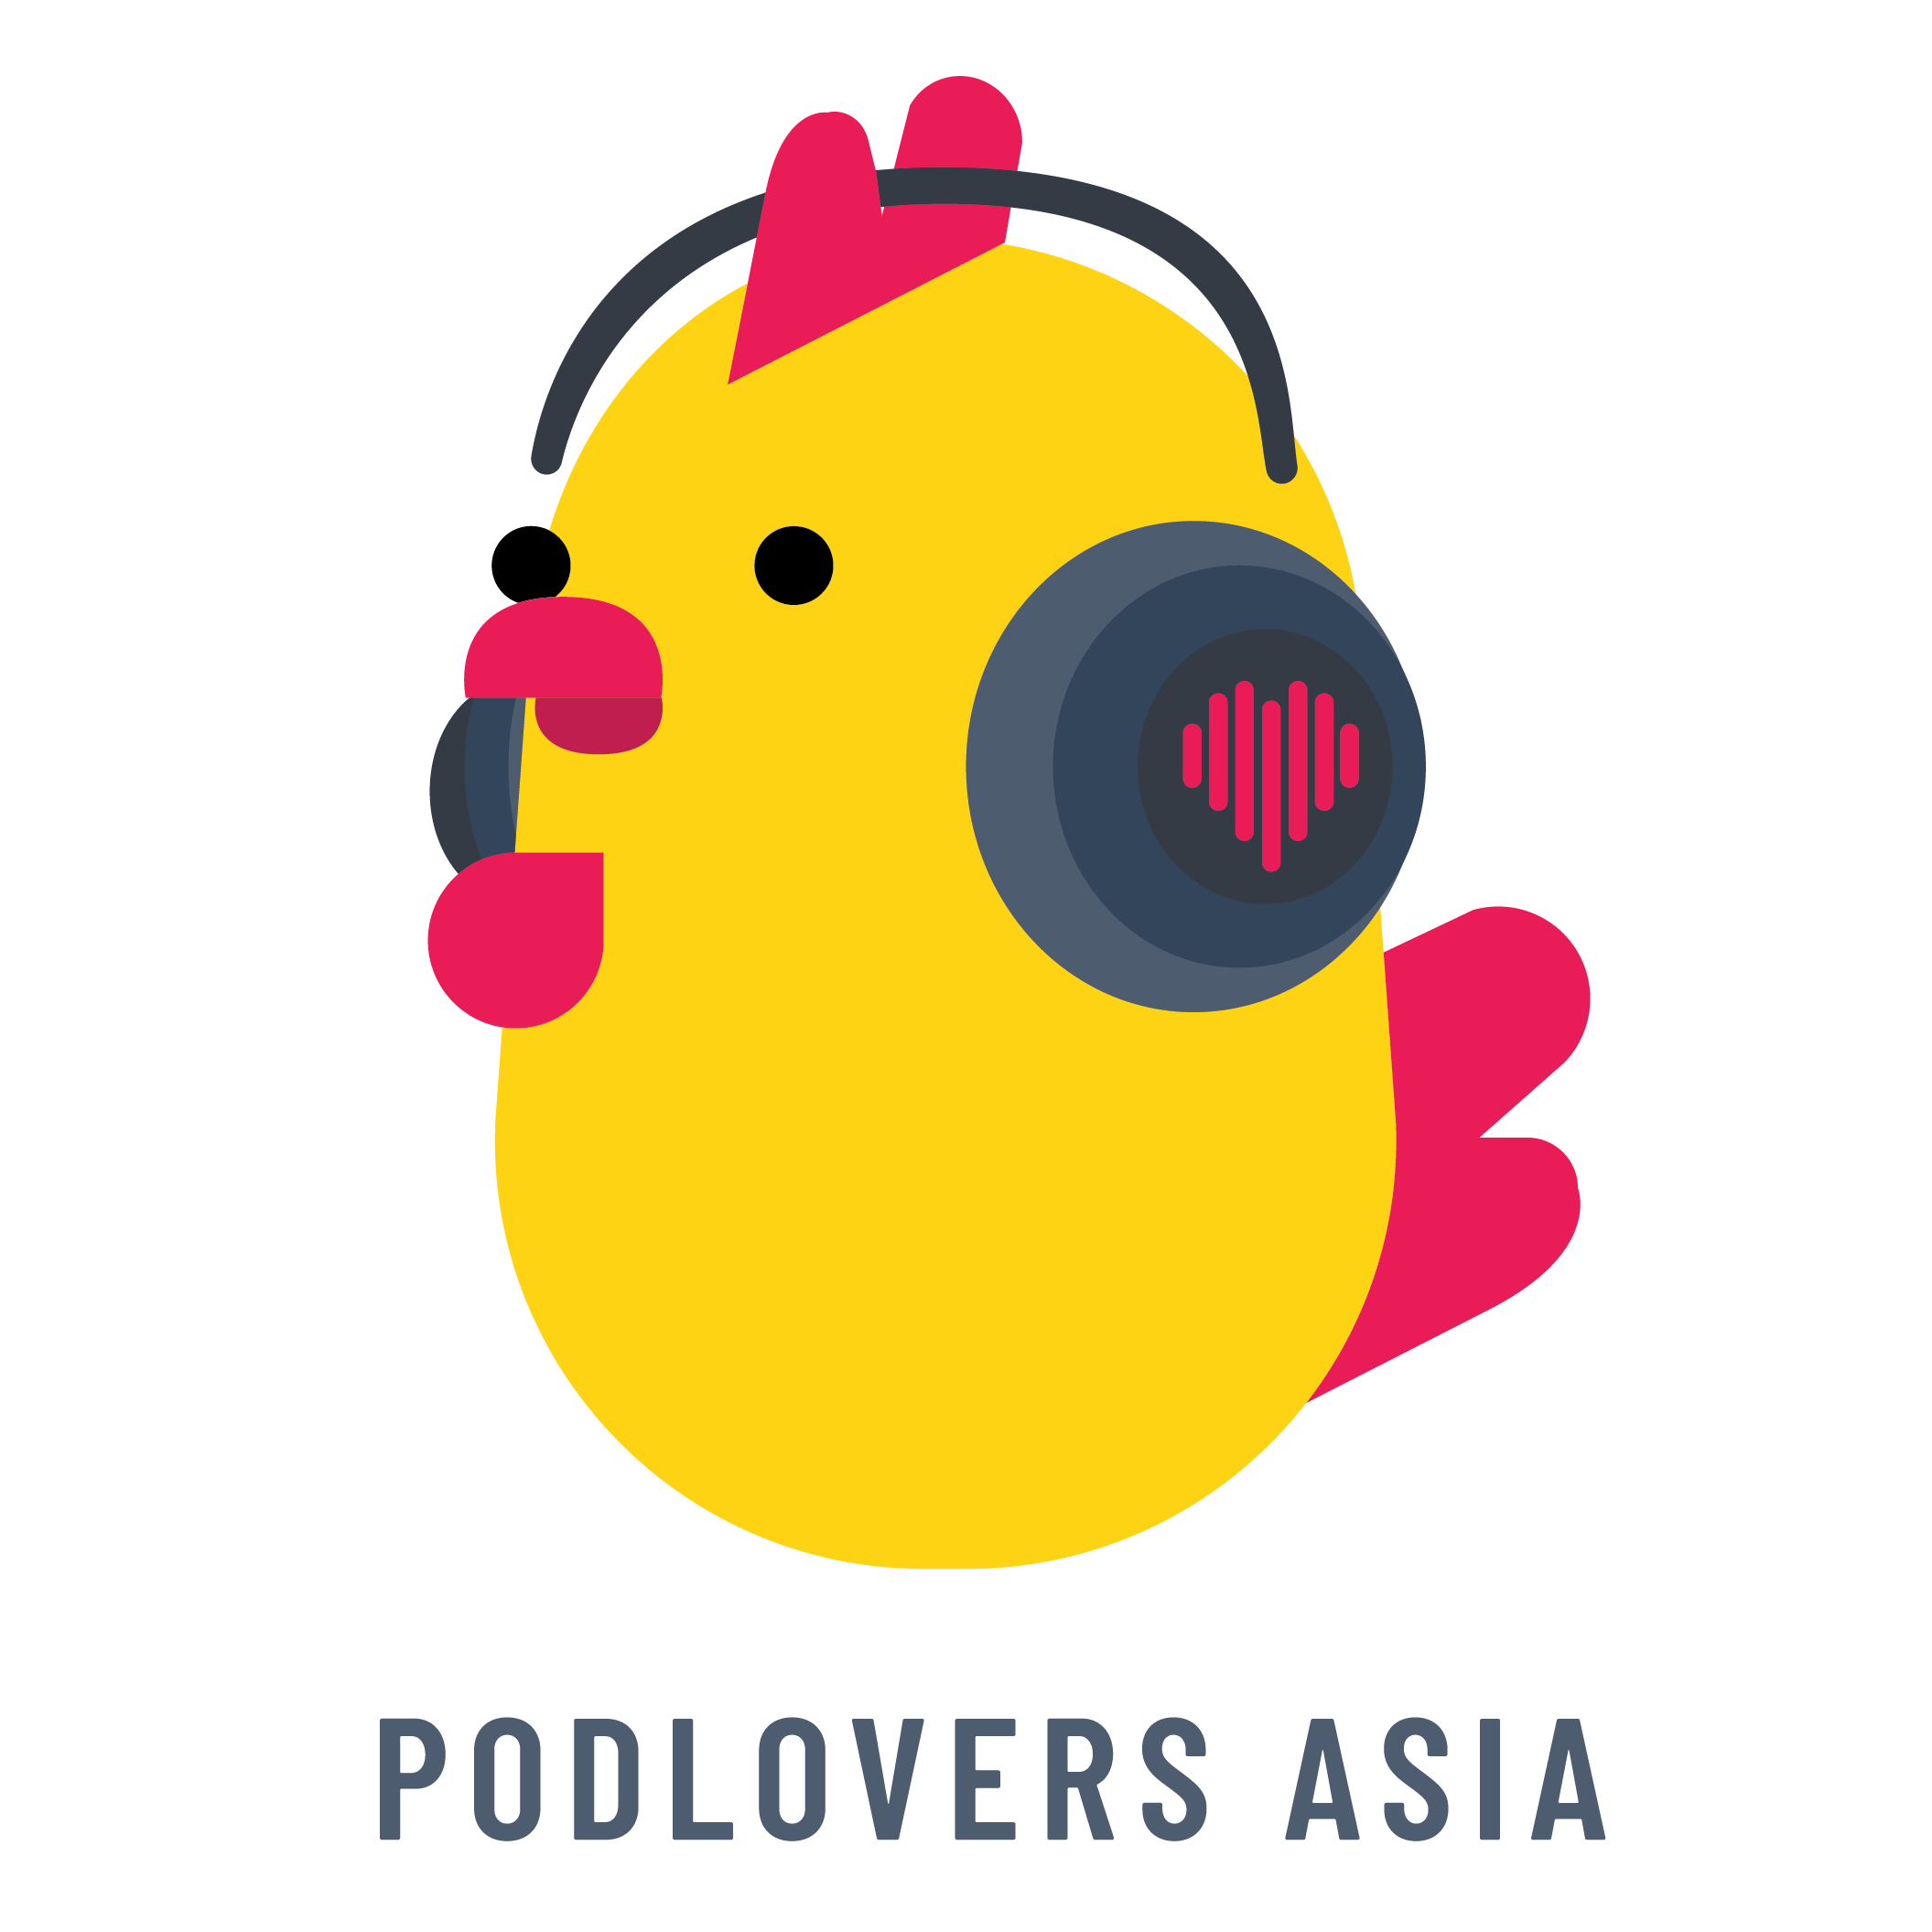 Podlovers Asia